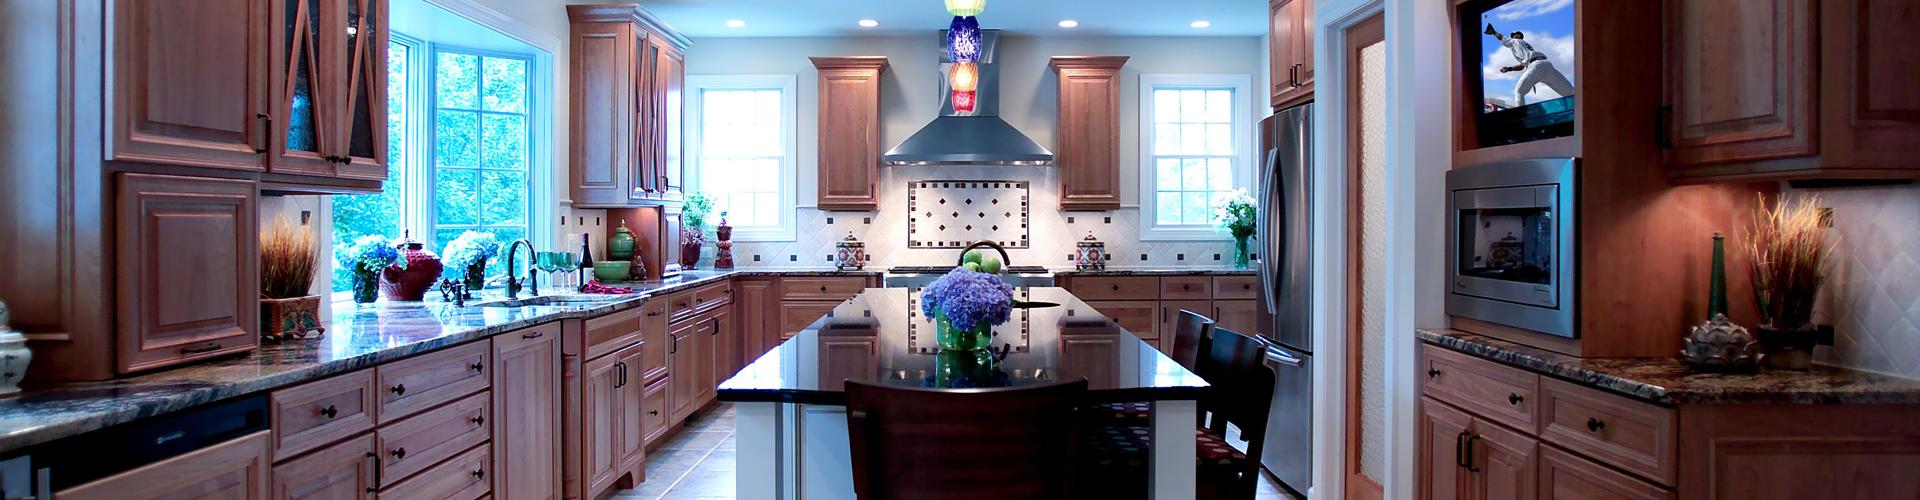 - Crema Marfil Subway Tile Backsplash Kitchen Design Our